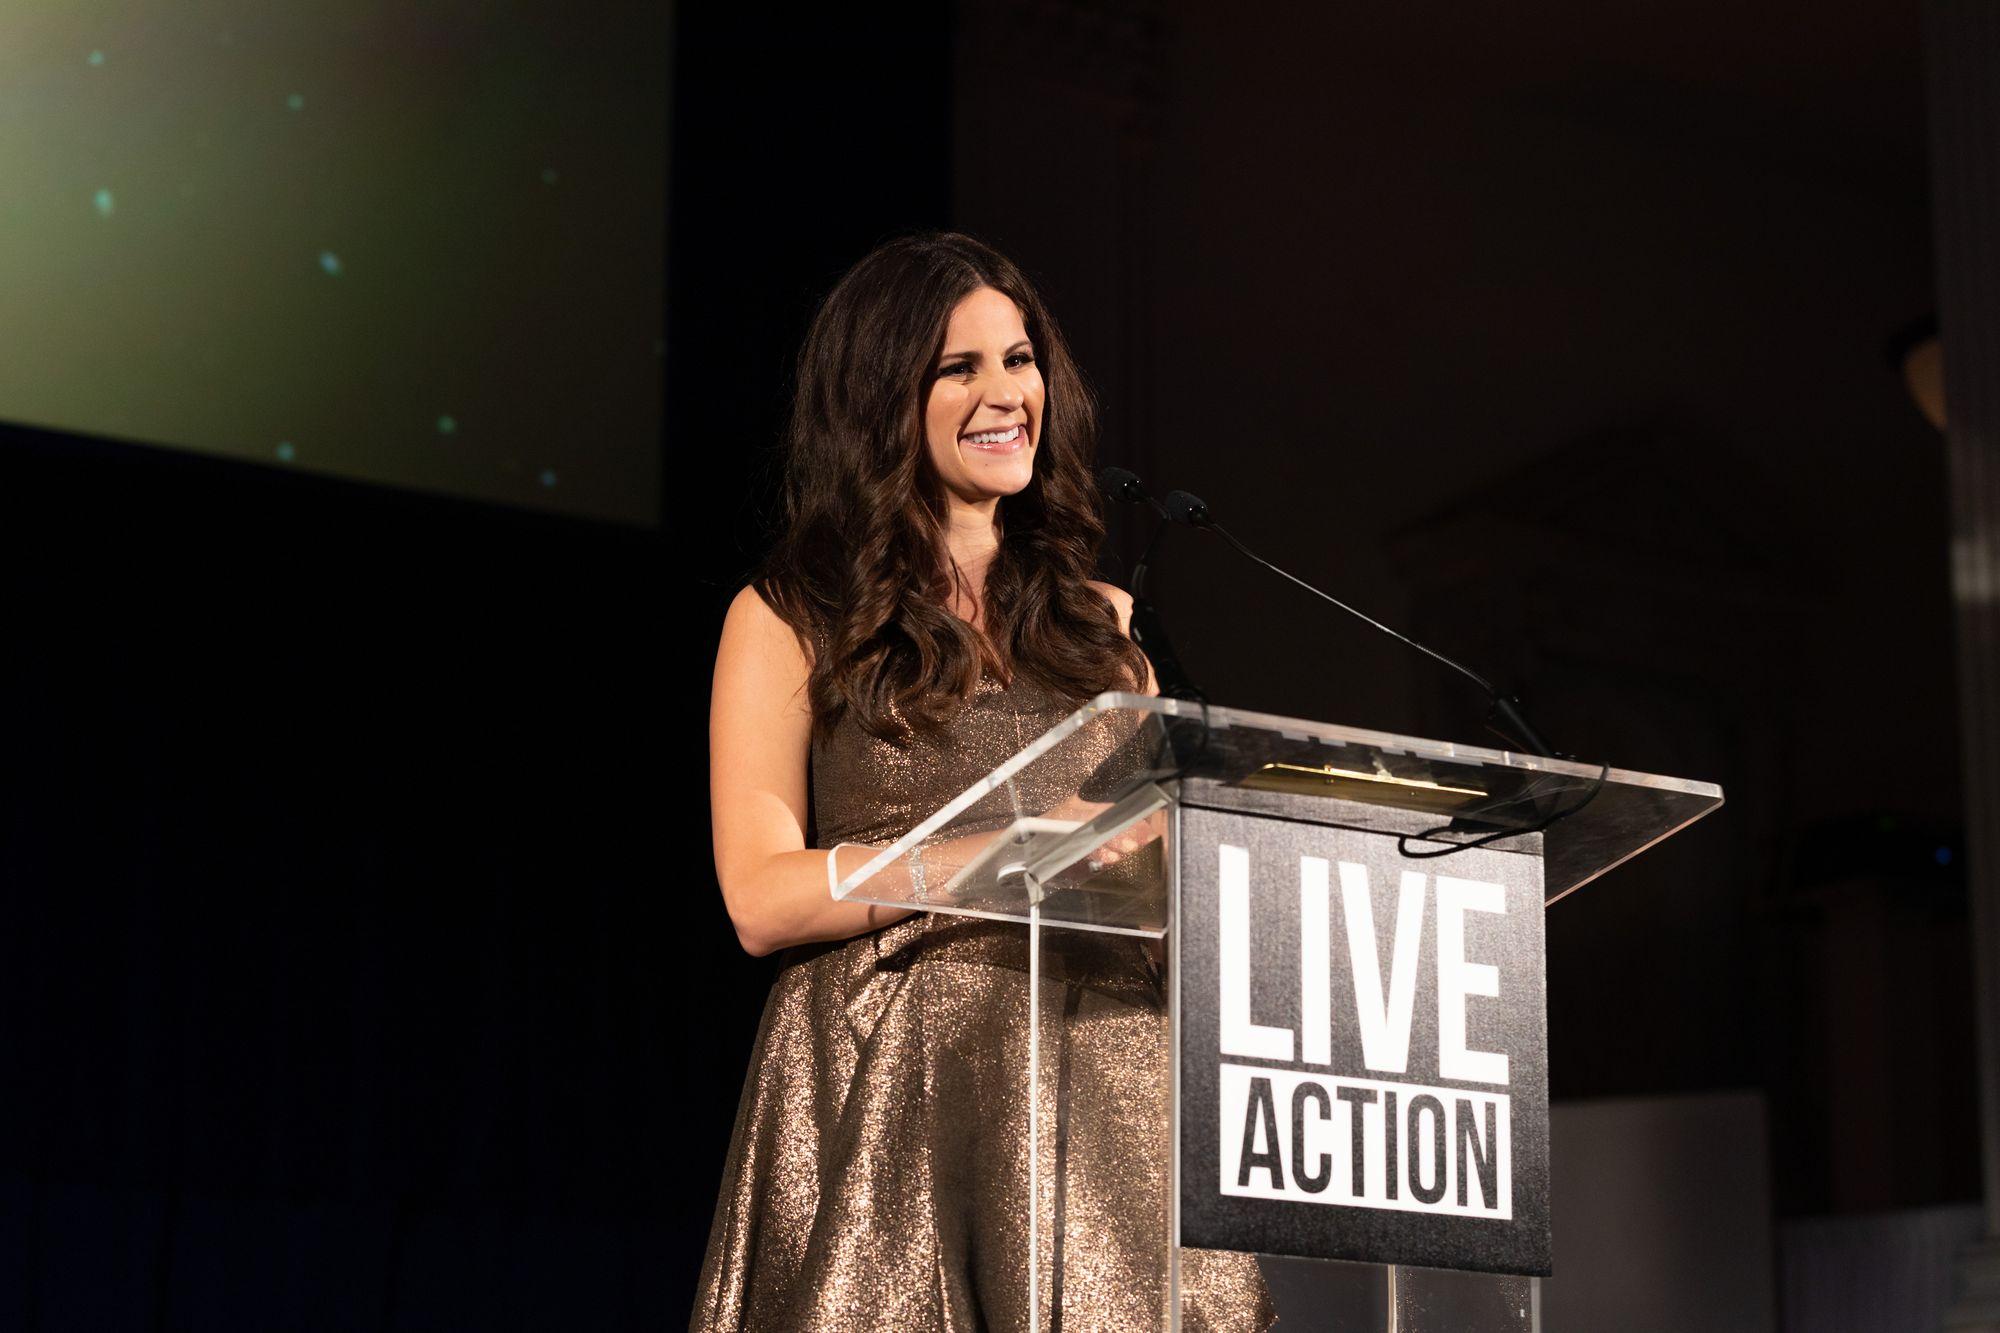 Live Action Hosts Inaugural Life Awards Gala